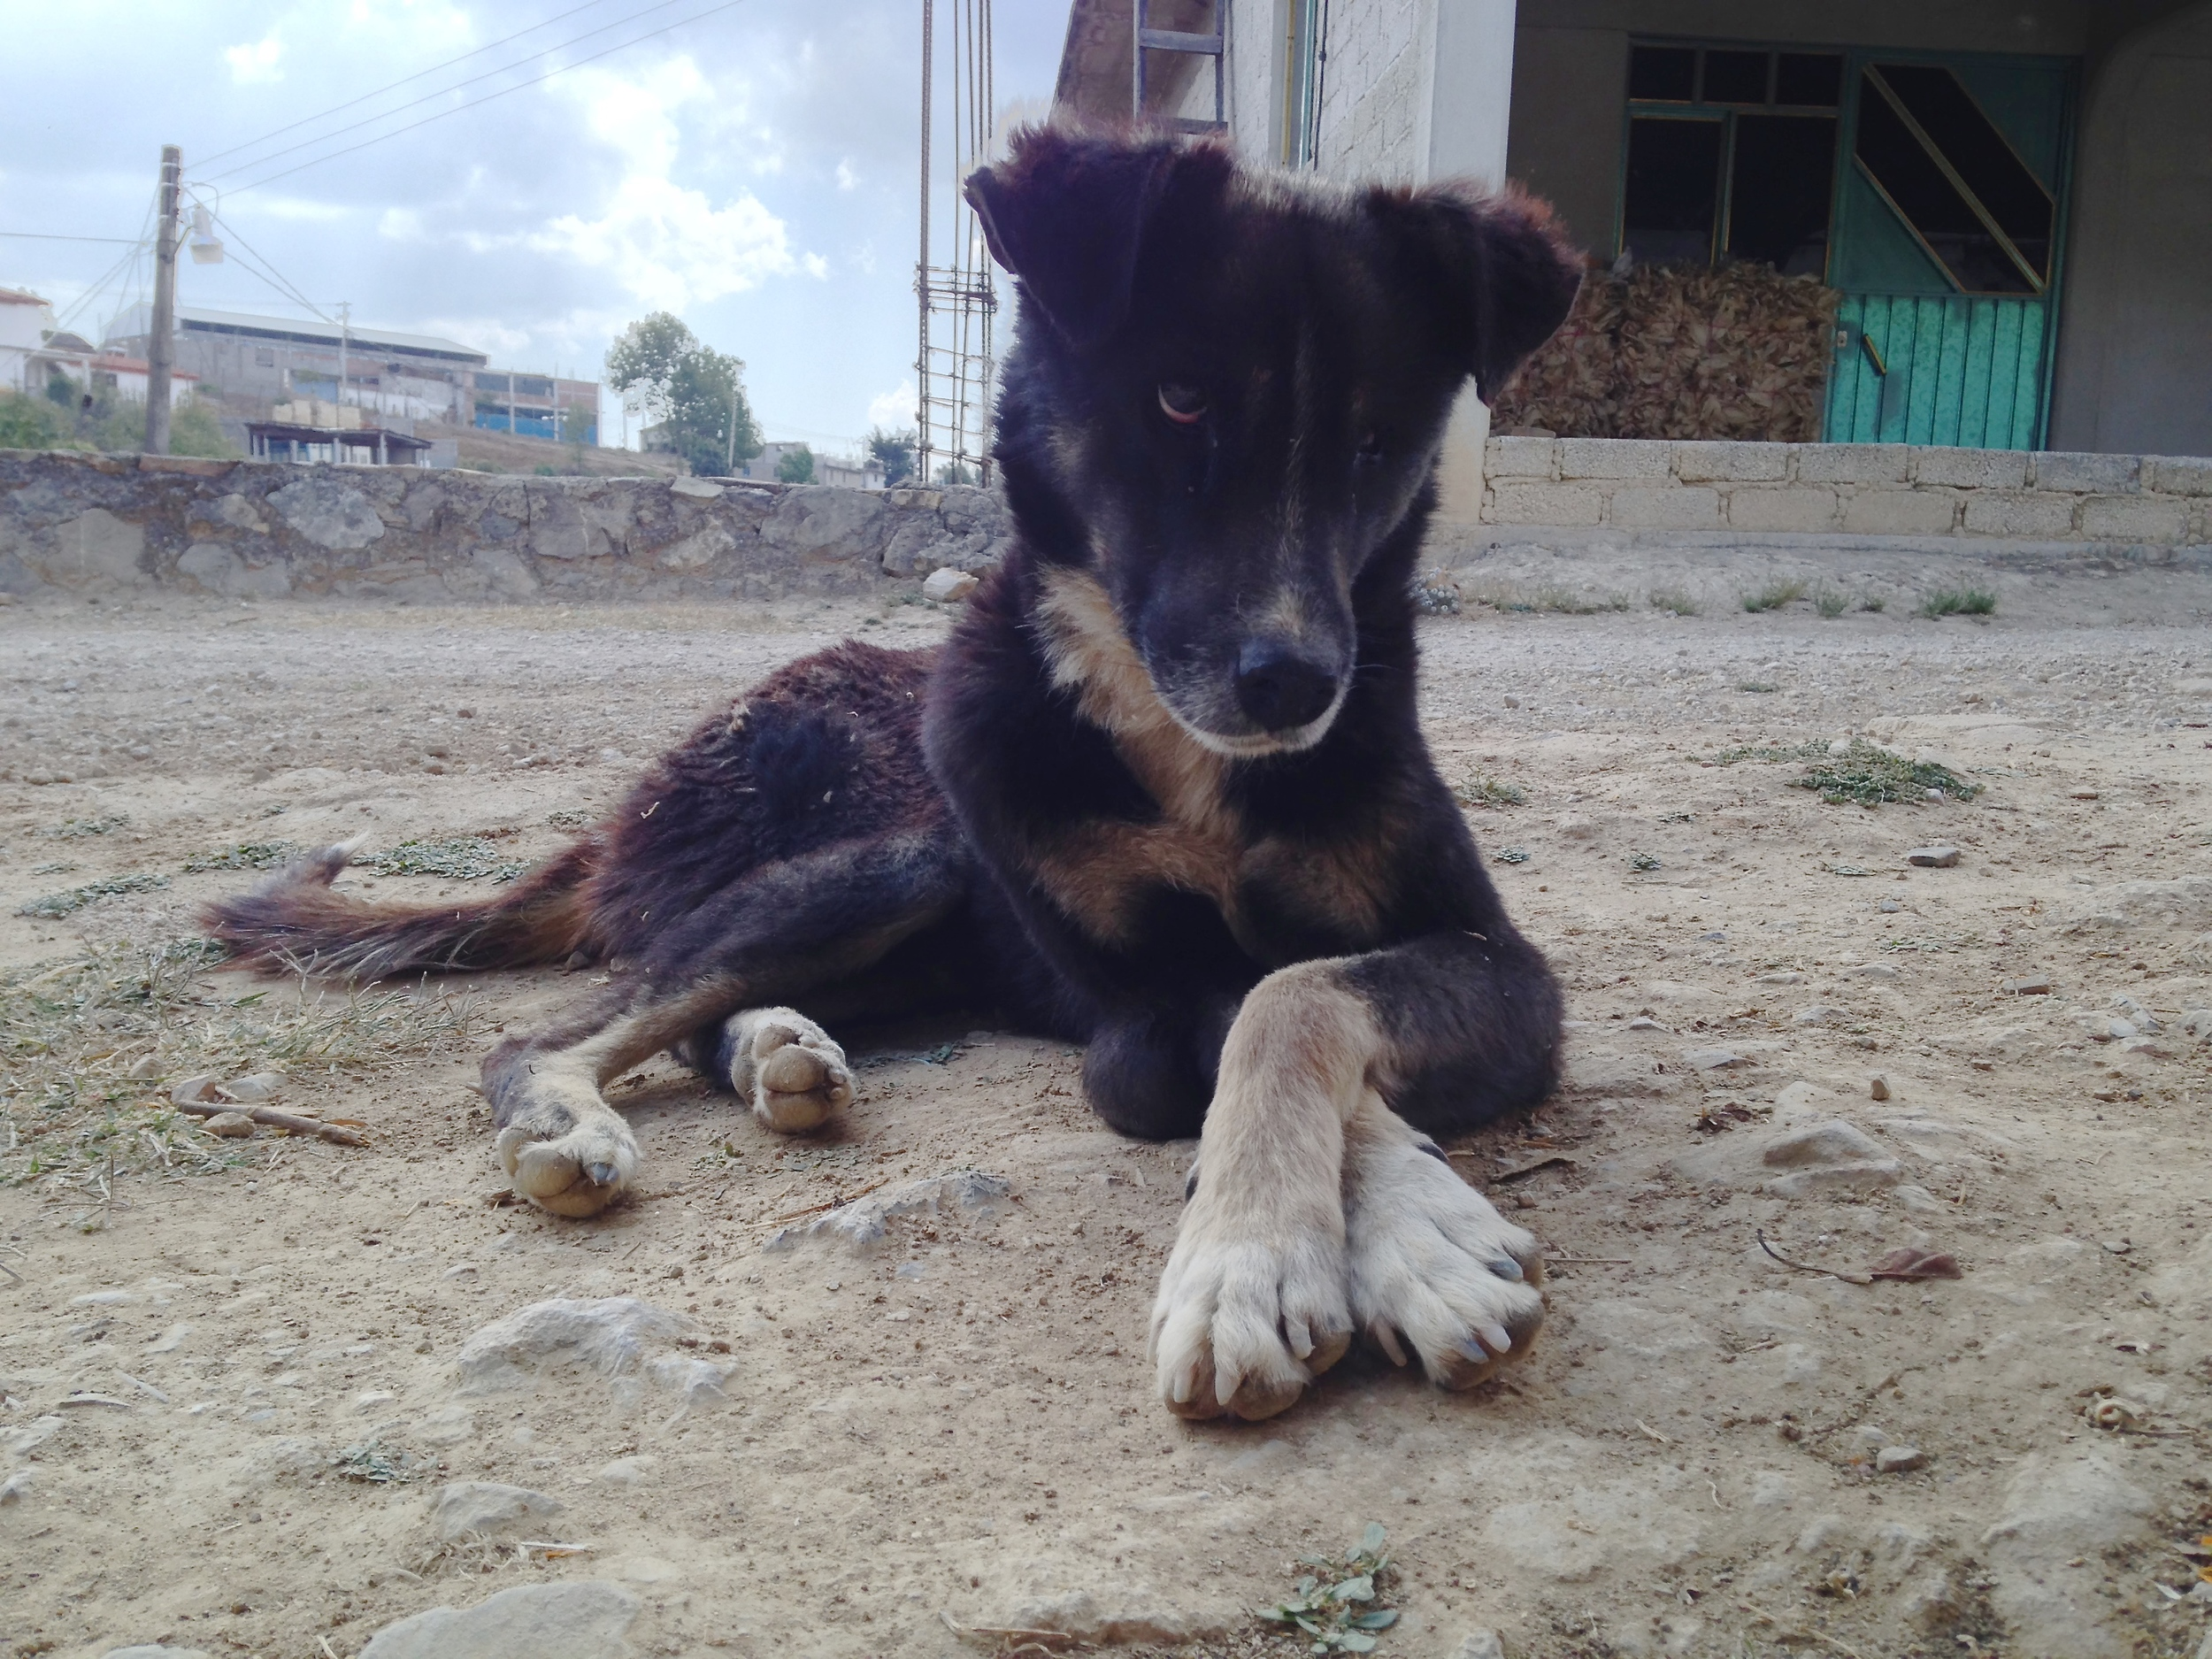 A pup poses in Santa Ana Yareni